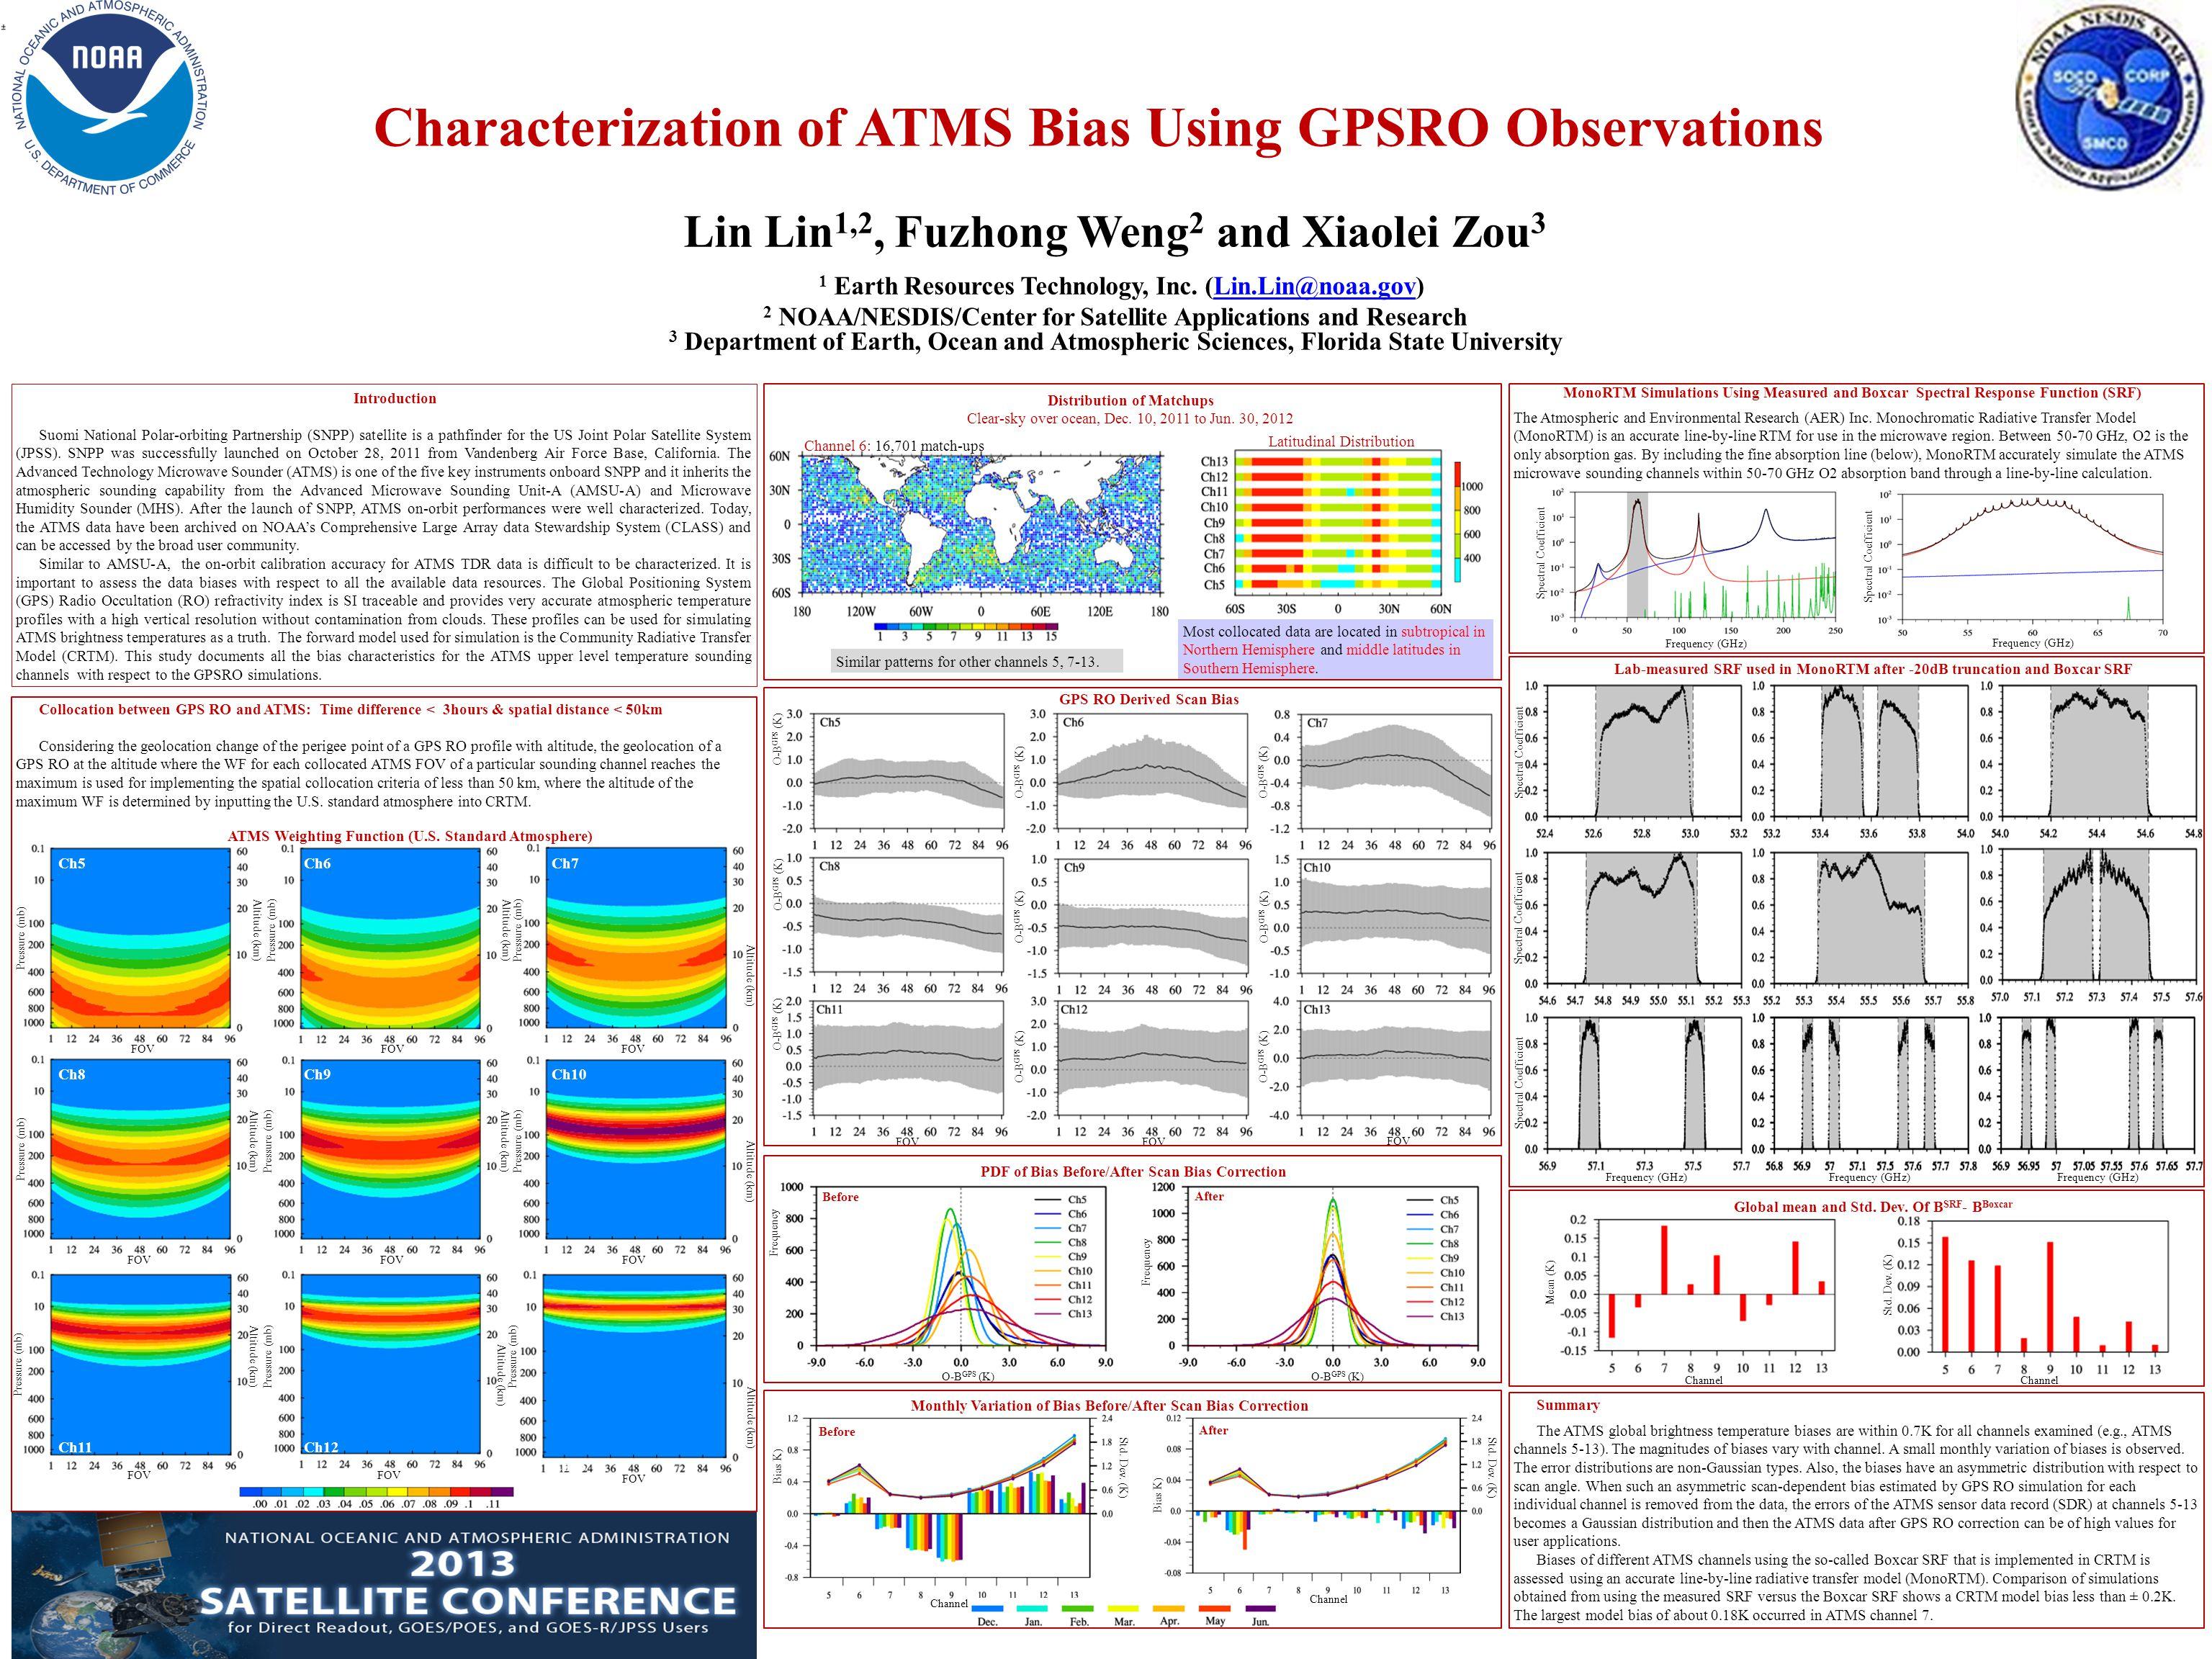 Characterization of ATMS Bias Using GPSRO Observations Lin Lin 1,2, Fuzhong Weng 2 and Xiaolei Zou 3 1 Earth Resources Technology, Inc.